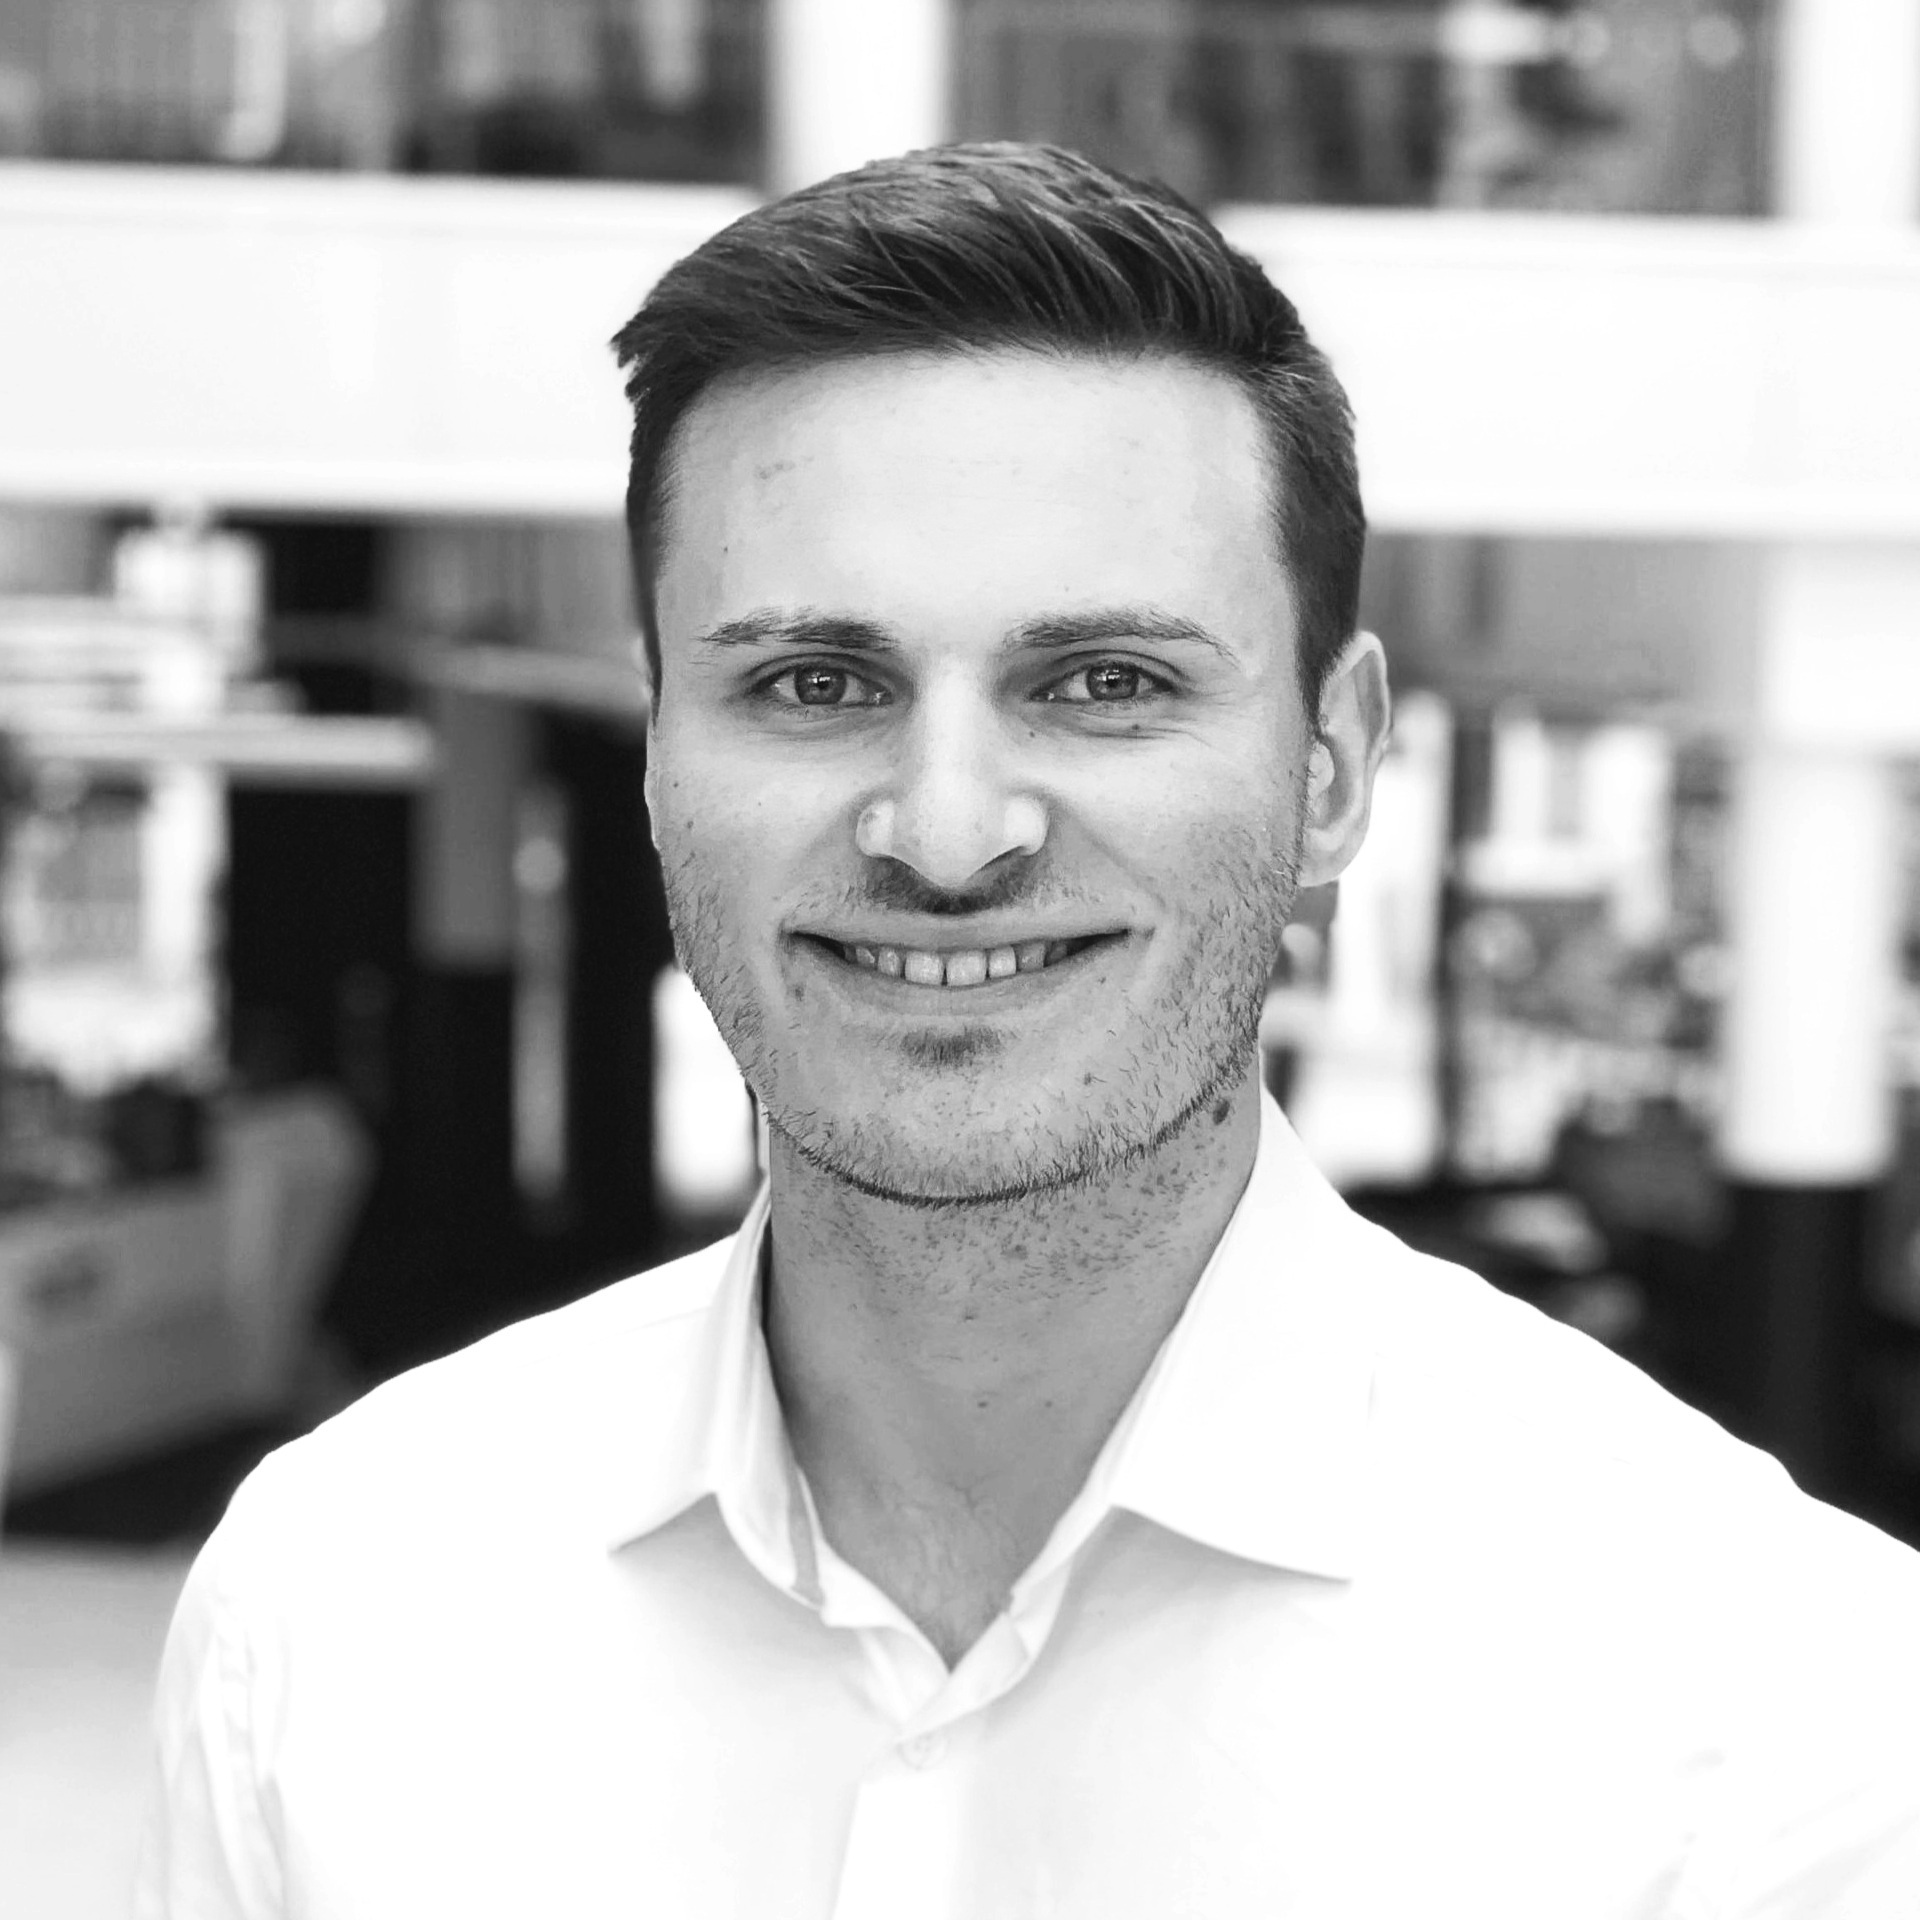 Håkon Kløve-Graue Lavik - Consultanthaakon@financeinnovation.no